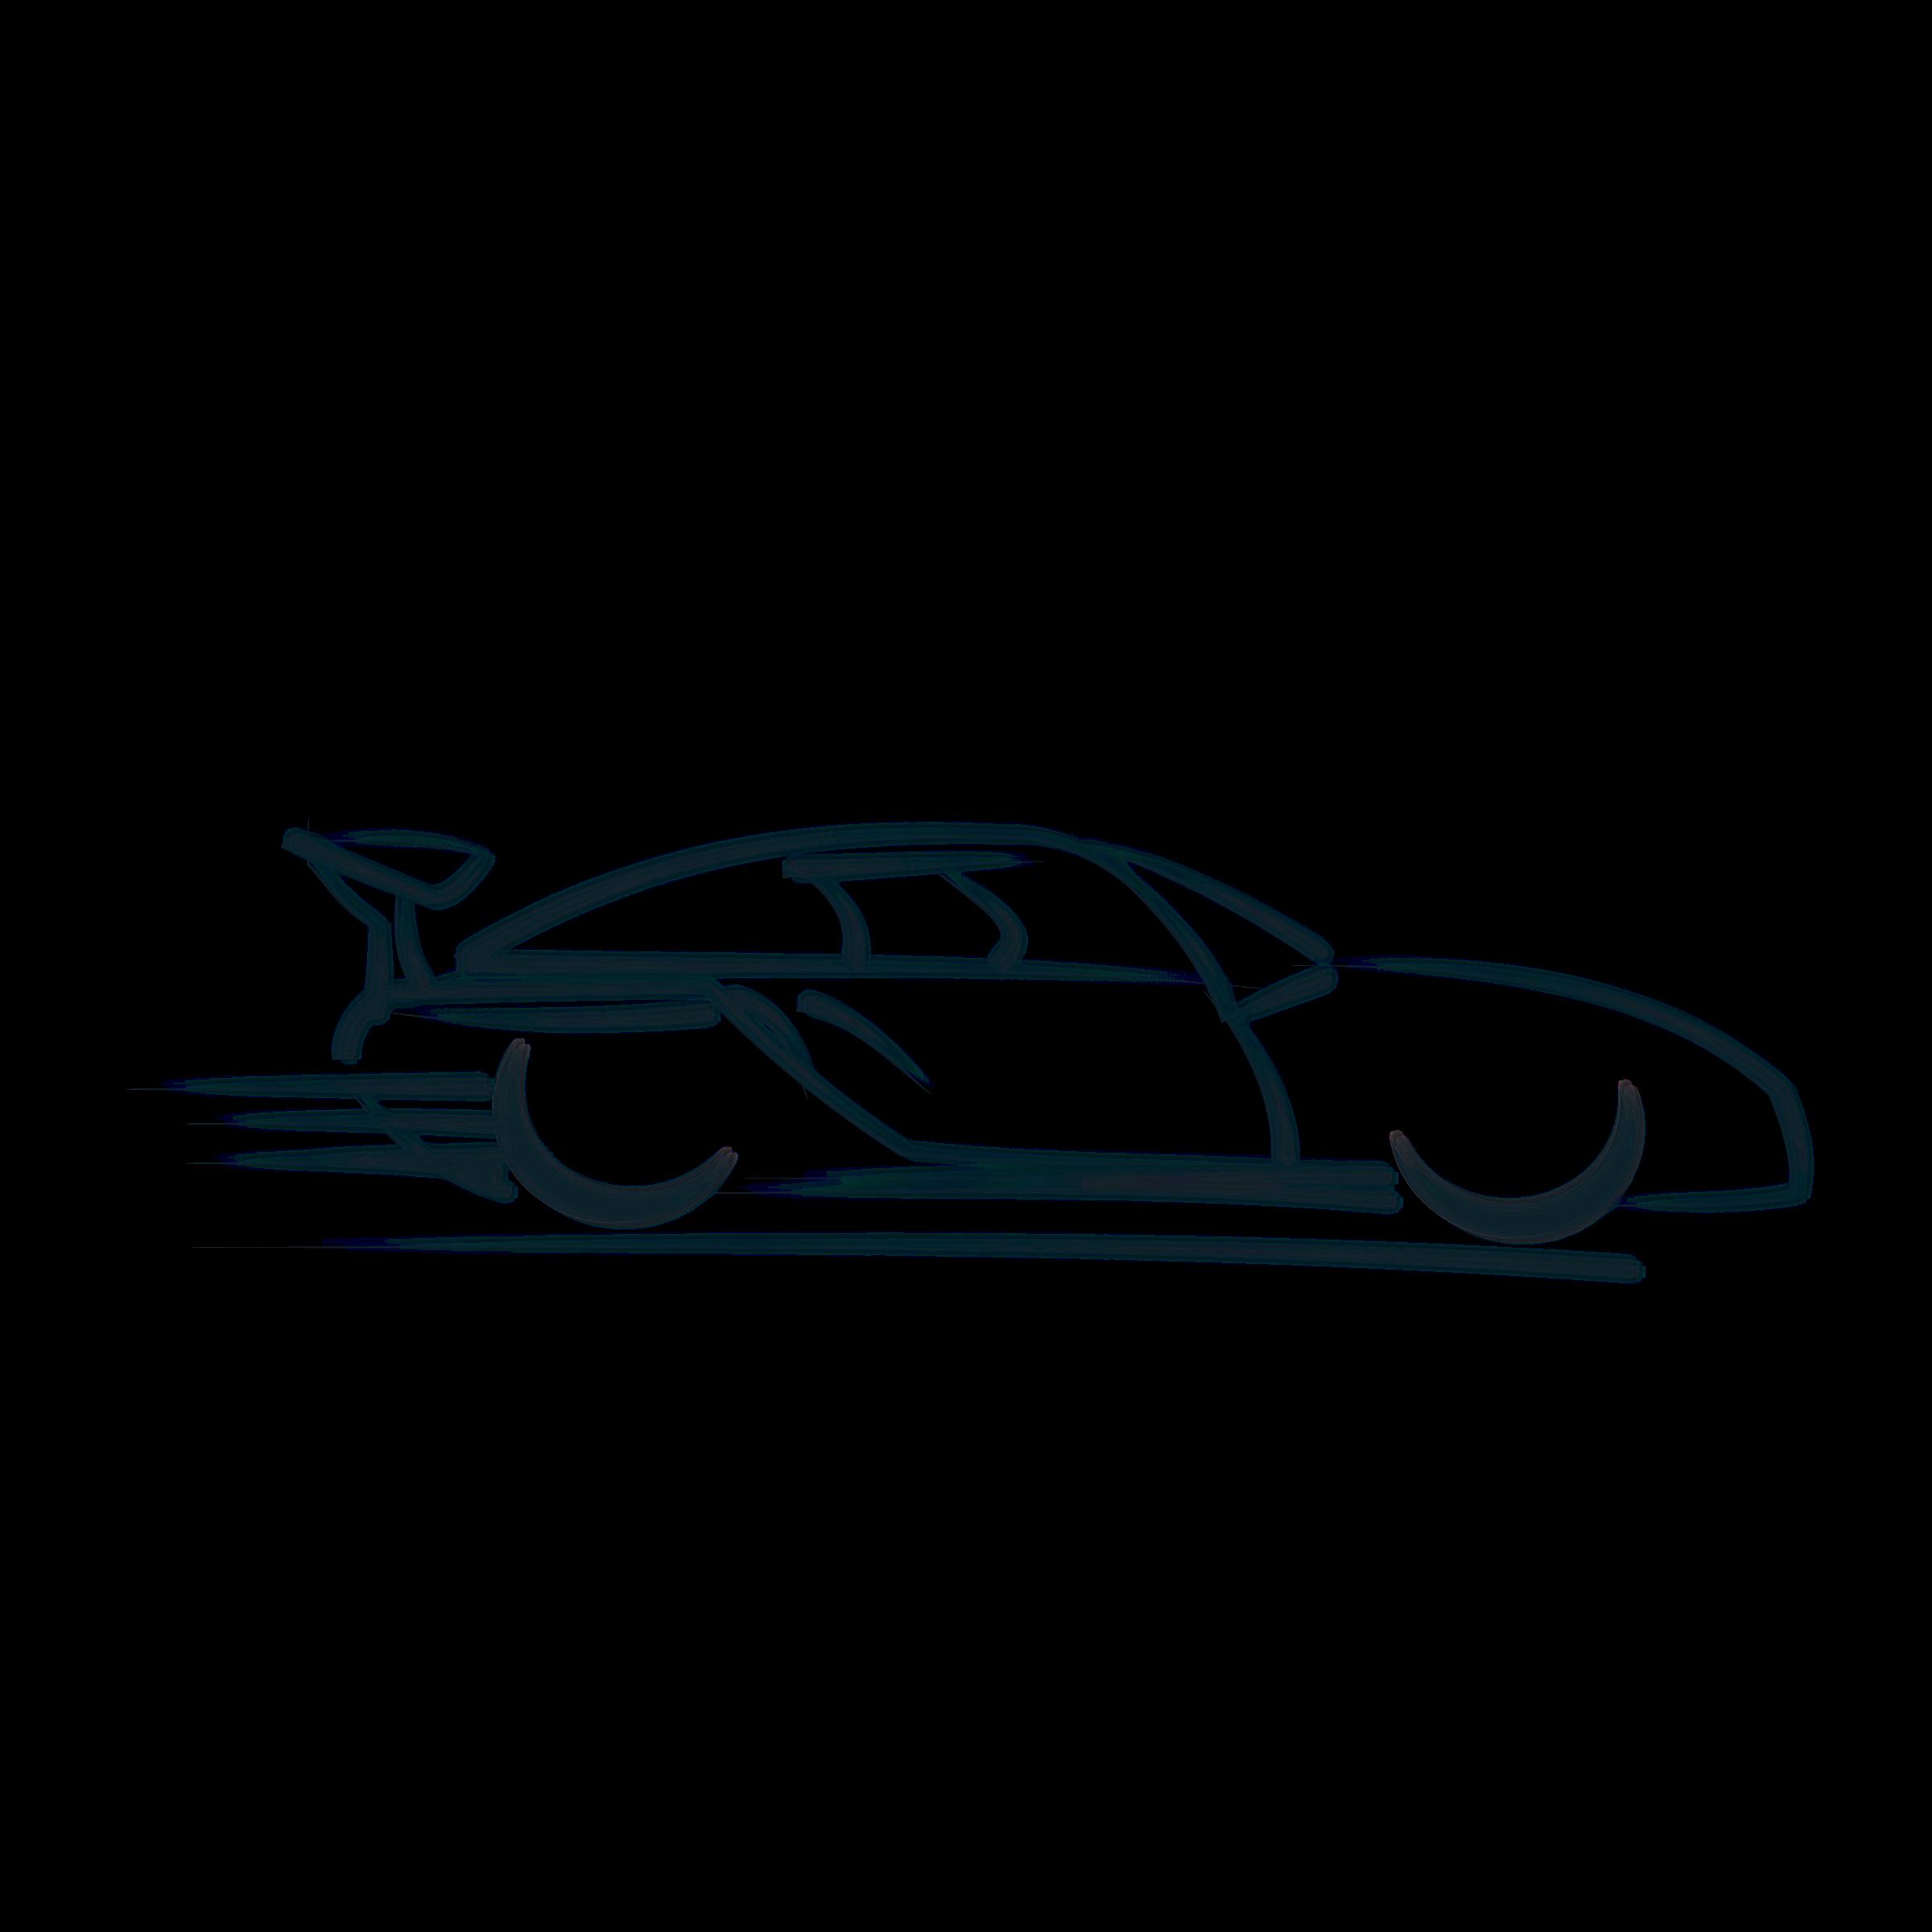 Driver clipart fast driver. Car icon big image